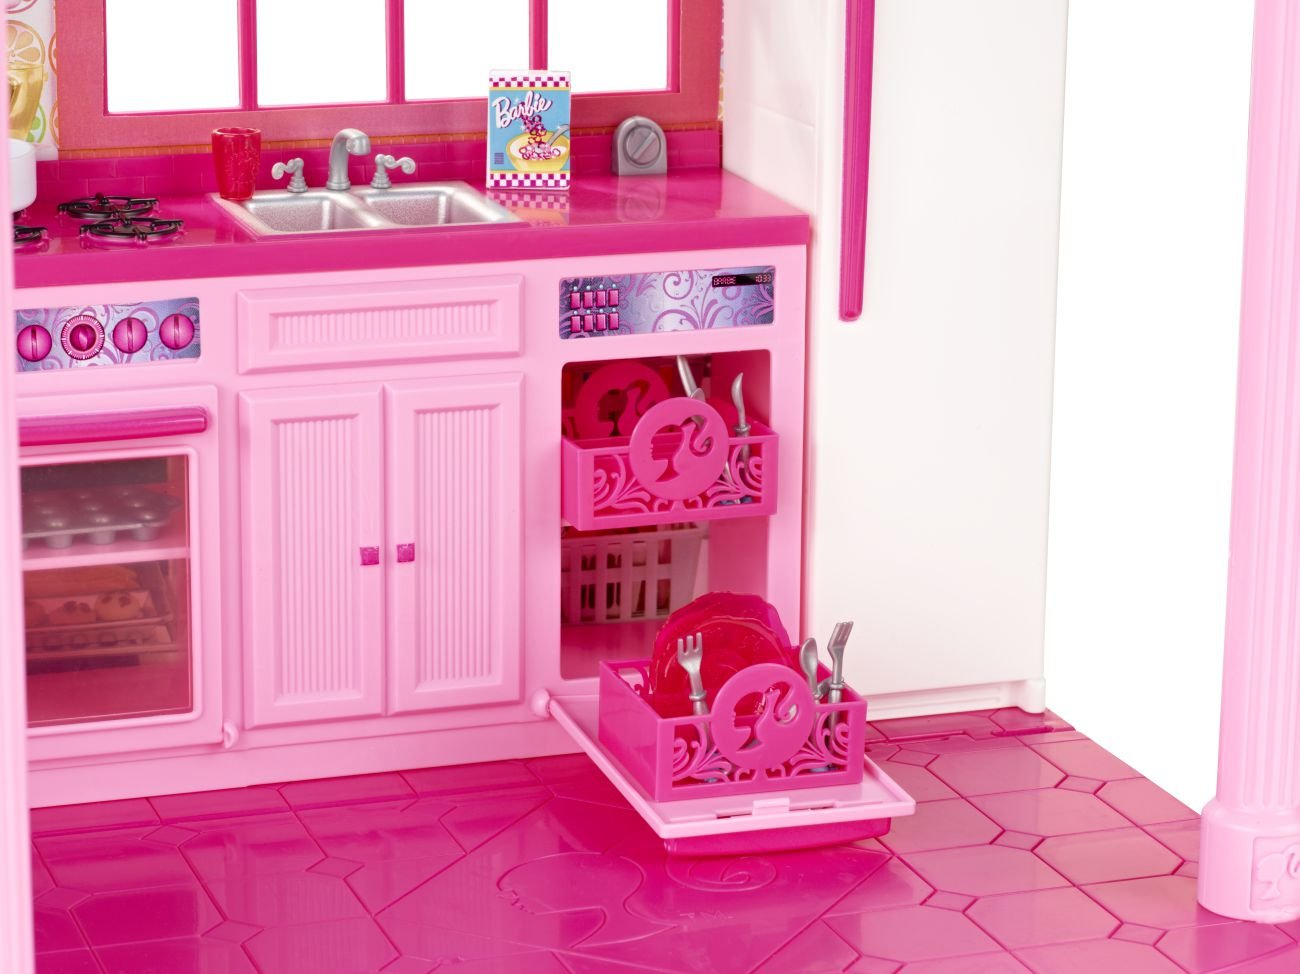 Barbie Kitchen Furniture Amazoncom Barbie 3 Story Dream Townhouse Toys Games